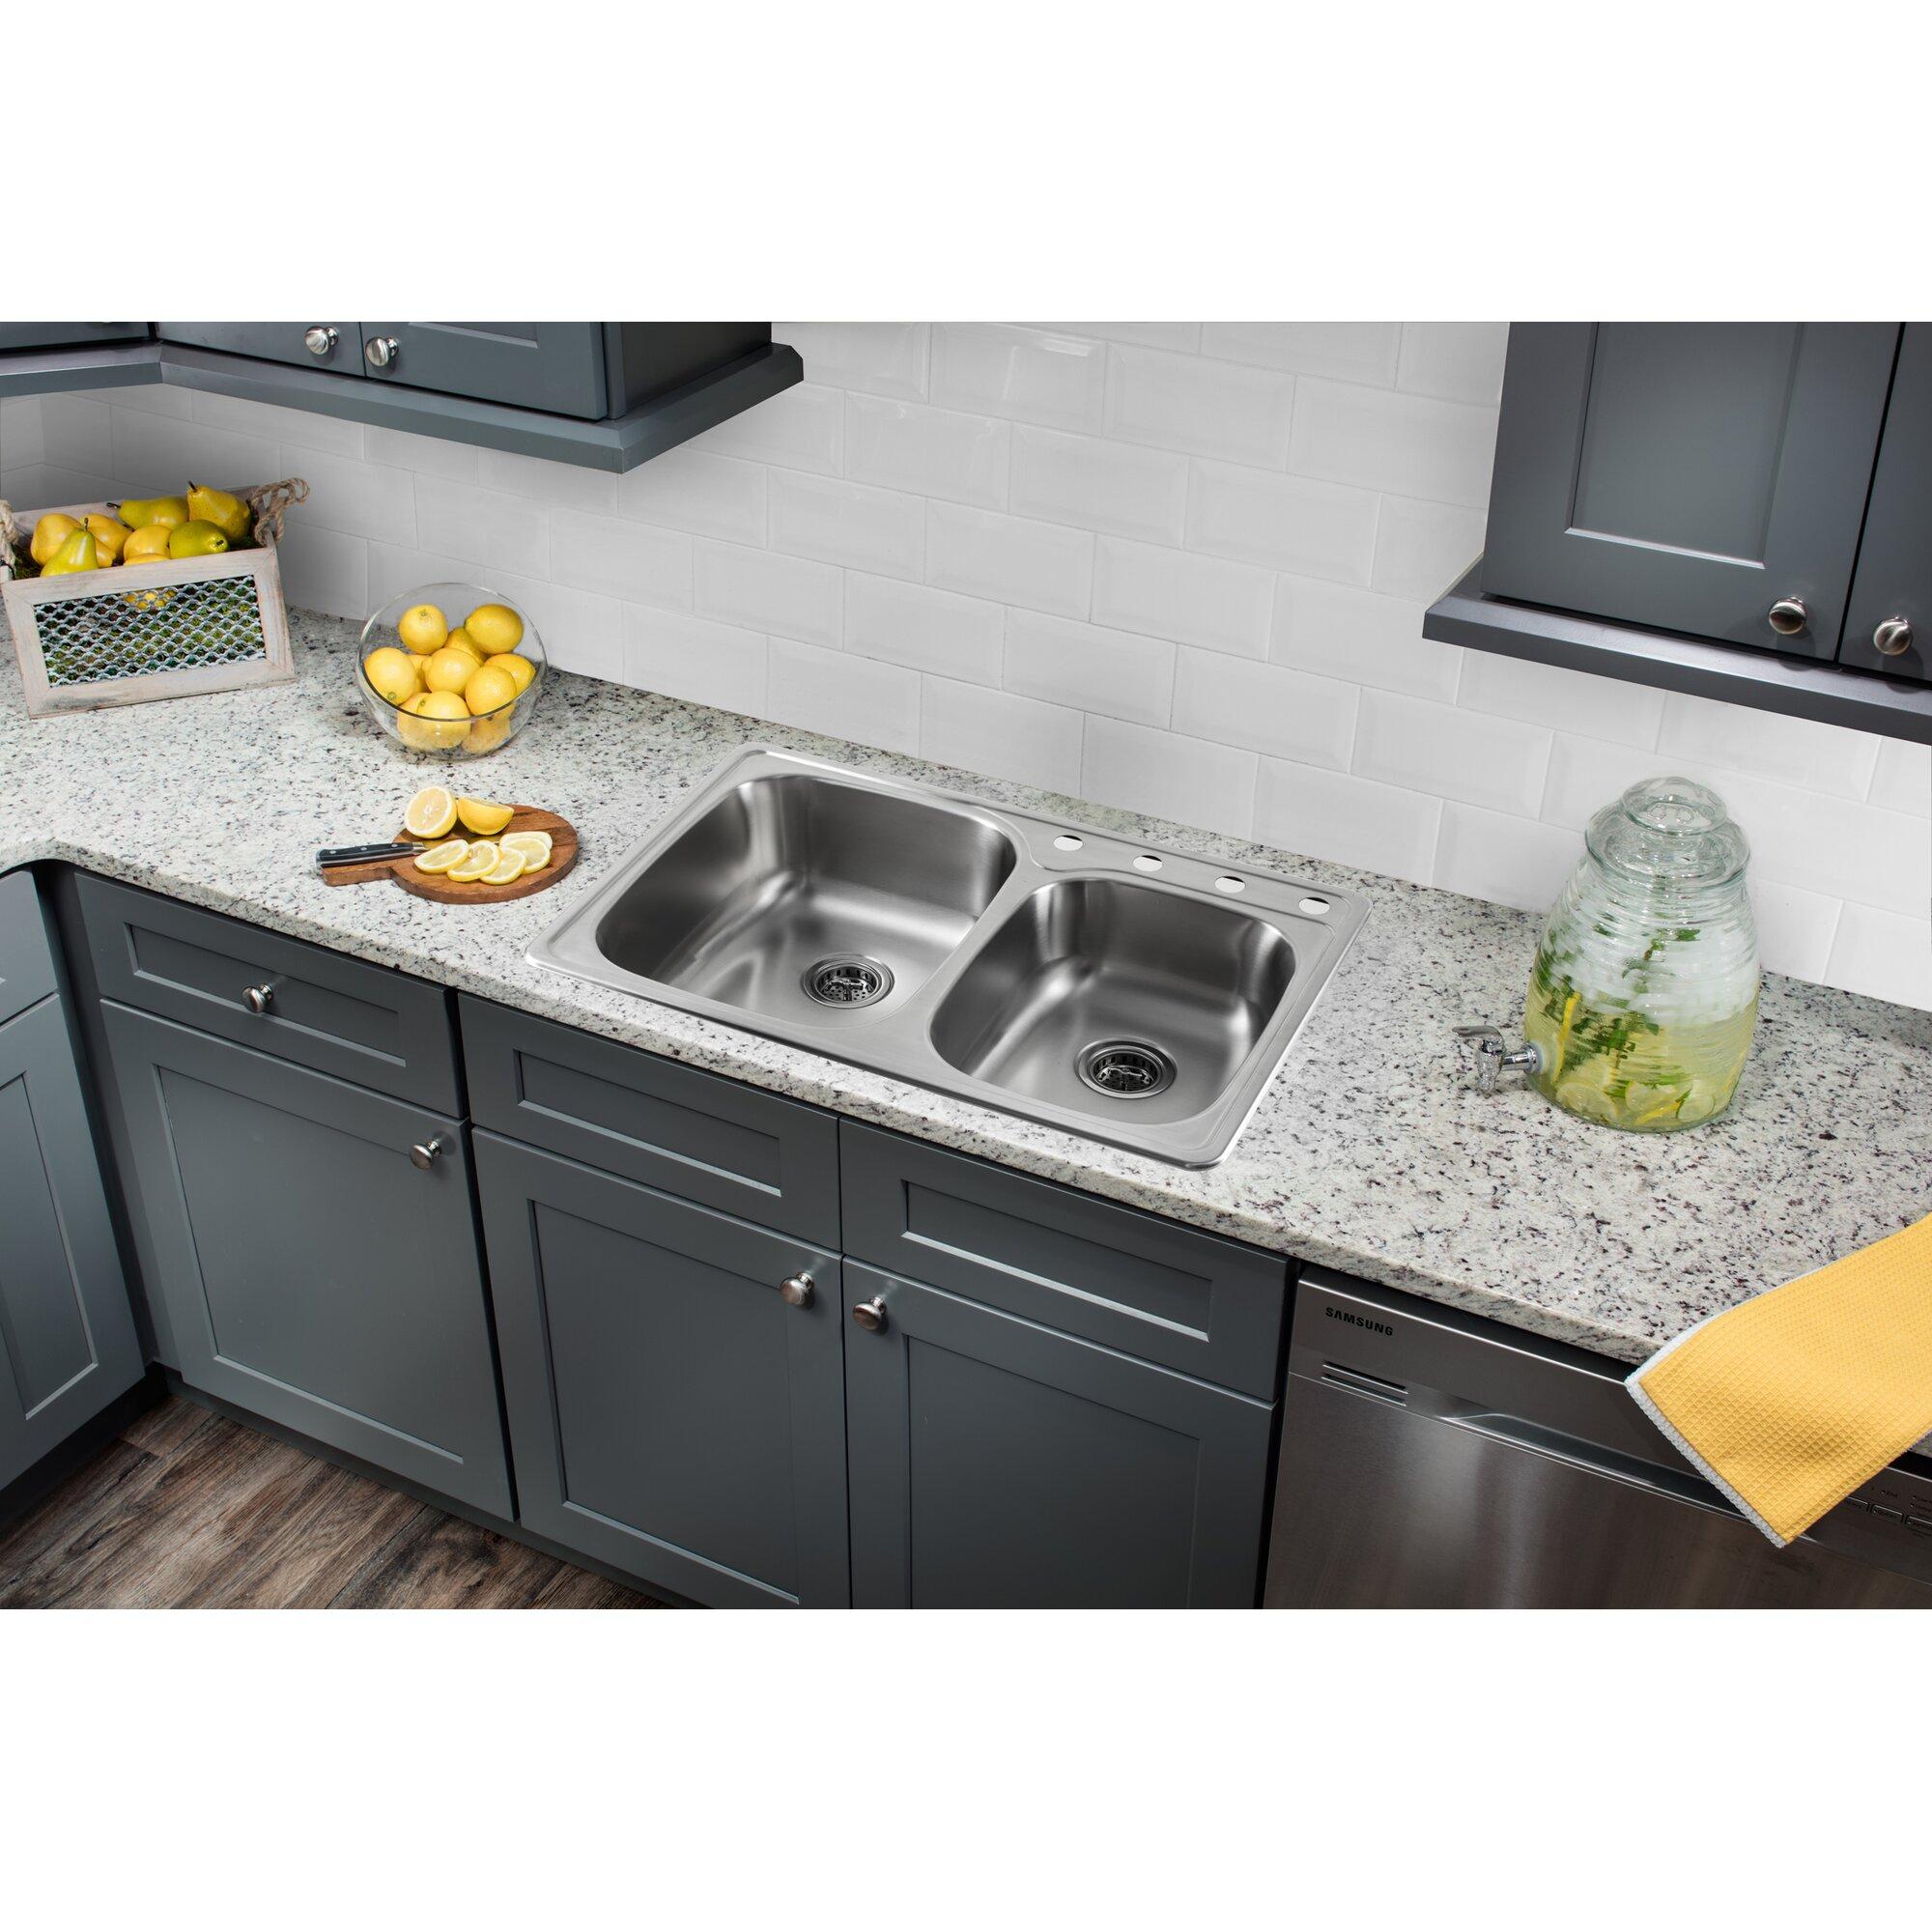 33 x 22 stainless steel drop in double bowl kitchen sink - Kitchen Sink Drop In